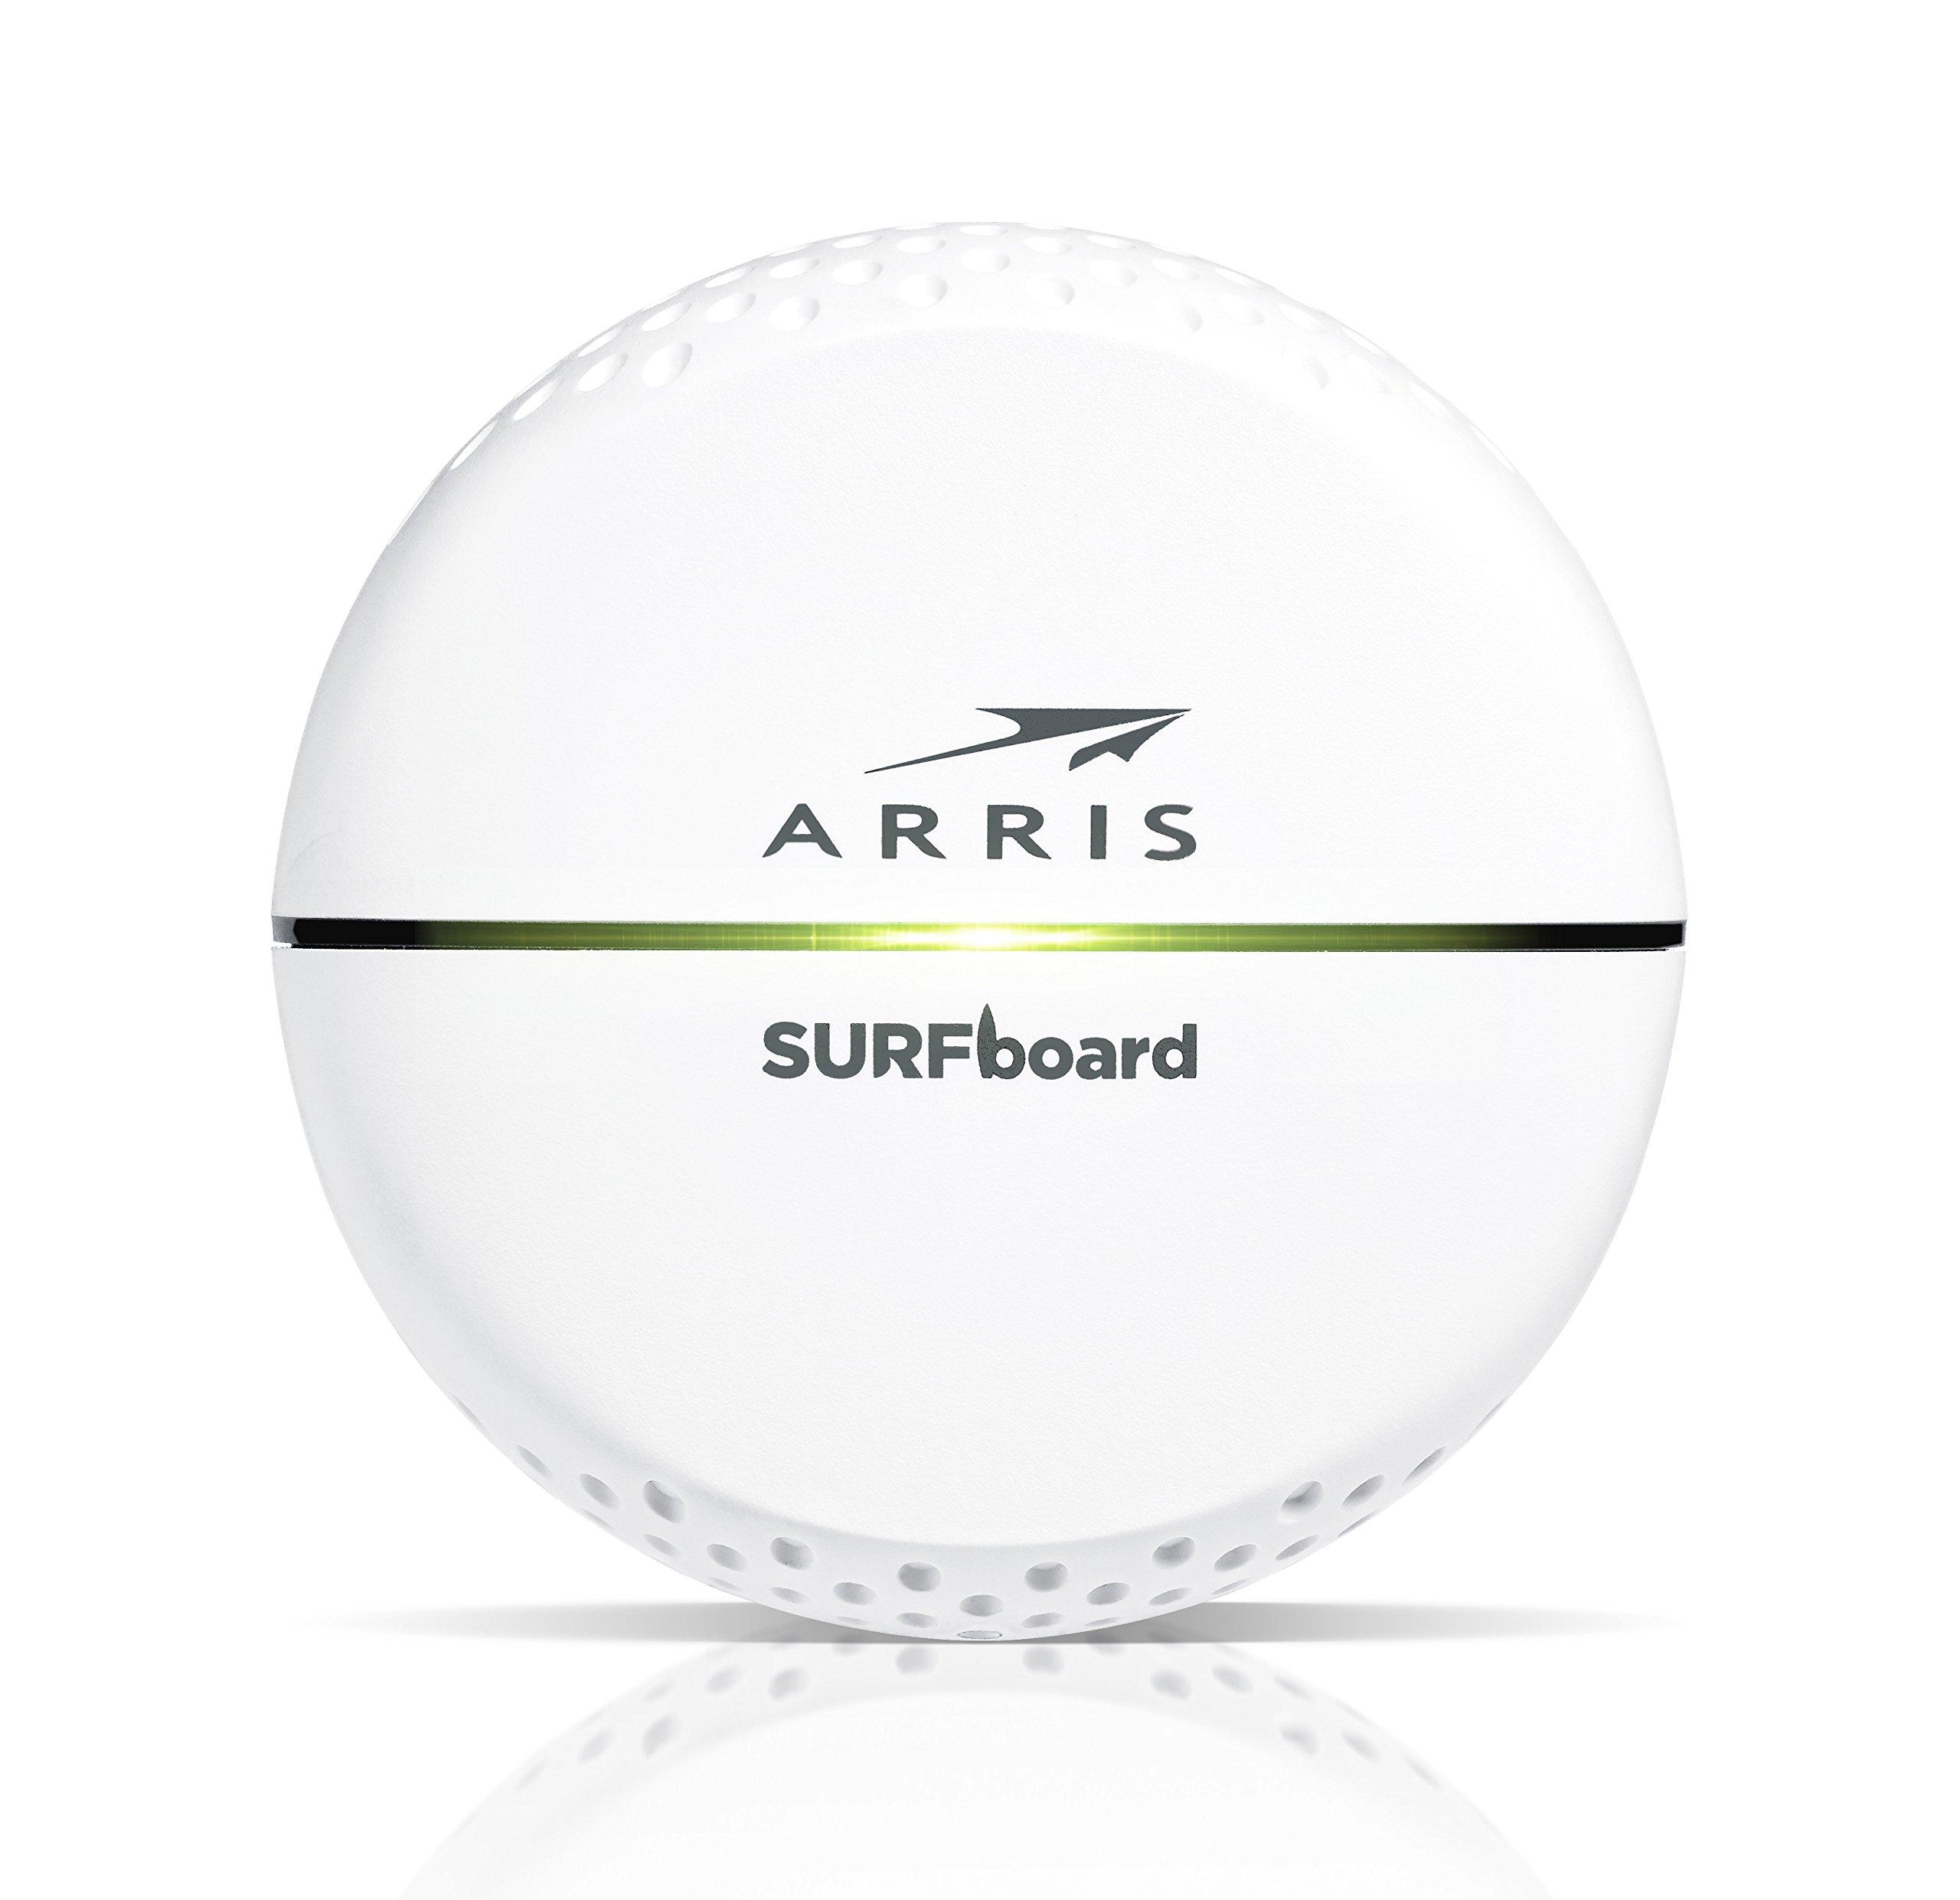 ARRIS SURFboard Wi-Fi Hotspot with Rip current Range Extender (SBX-AC1200P)